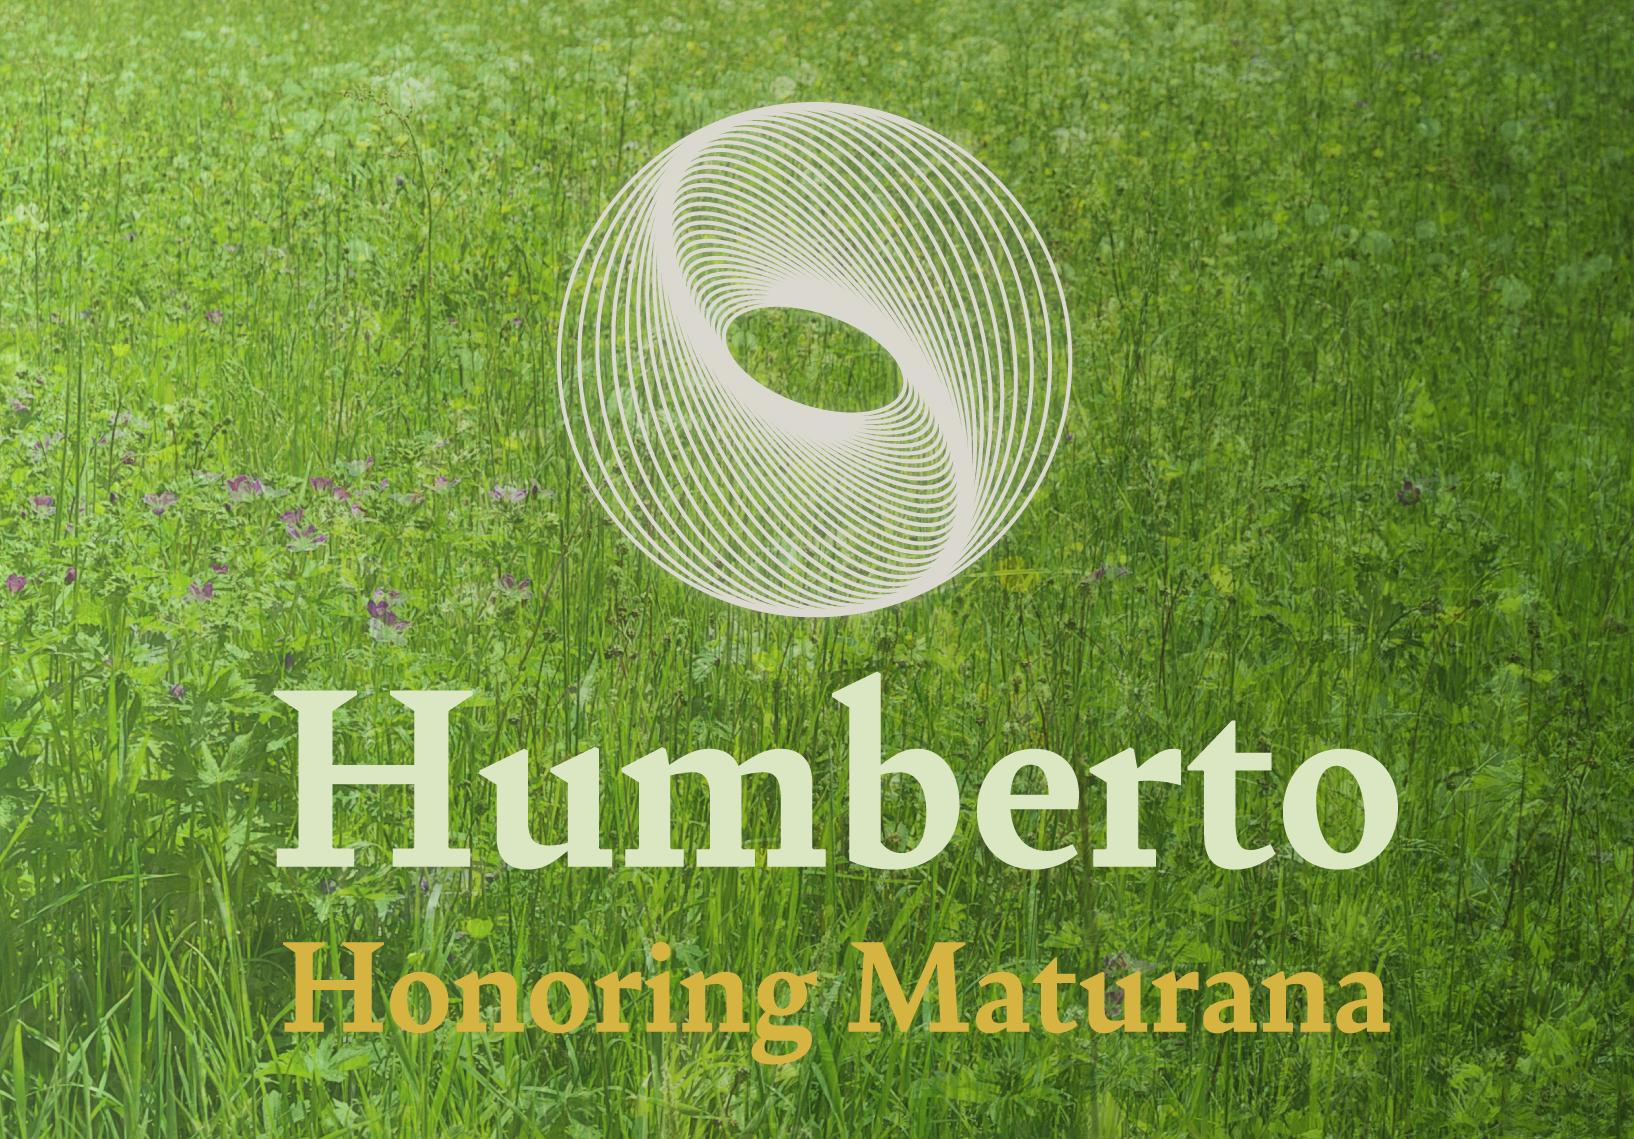 Logo for the festschrift programme honouring Humberto Maturana